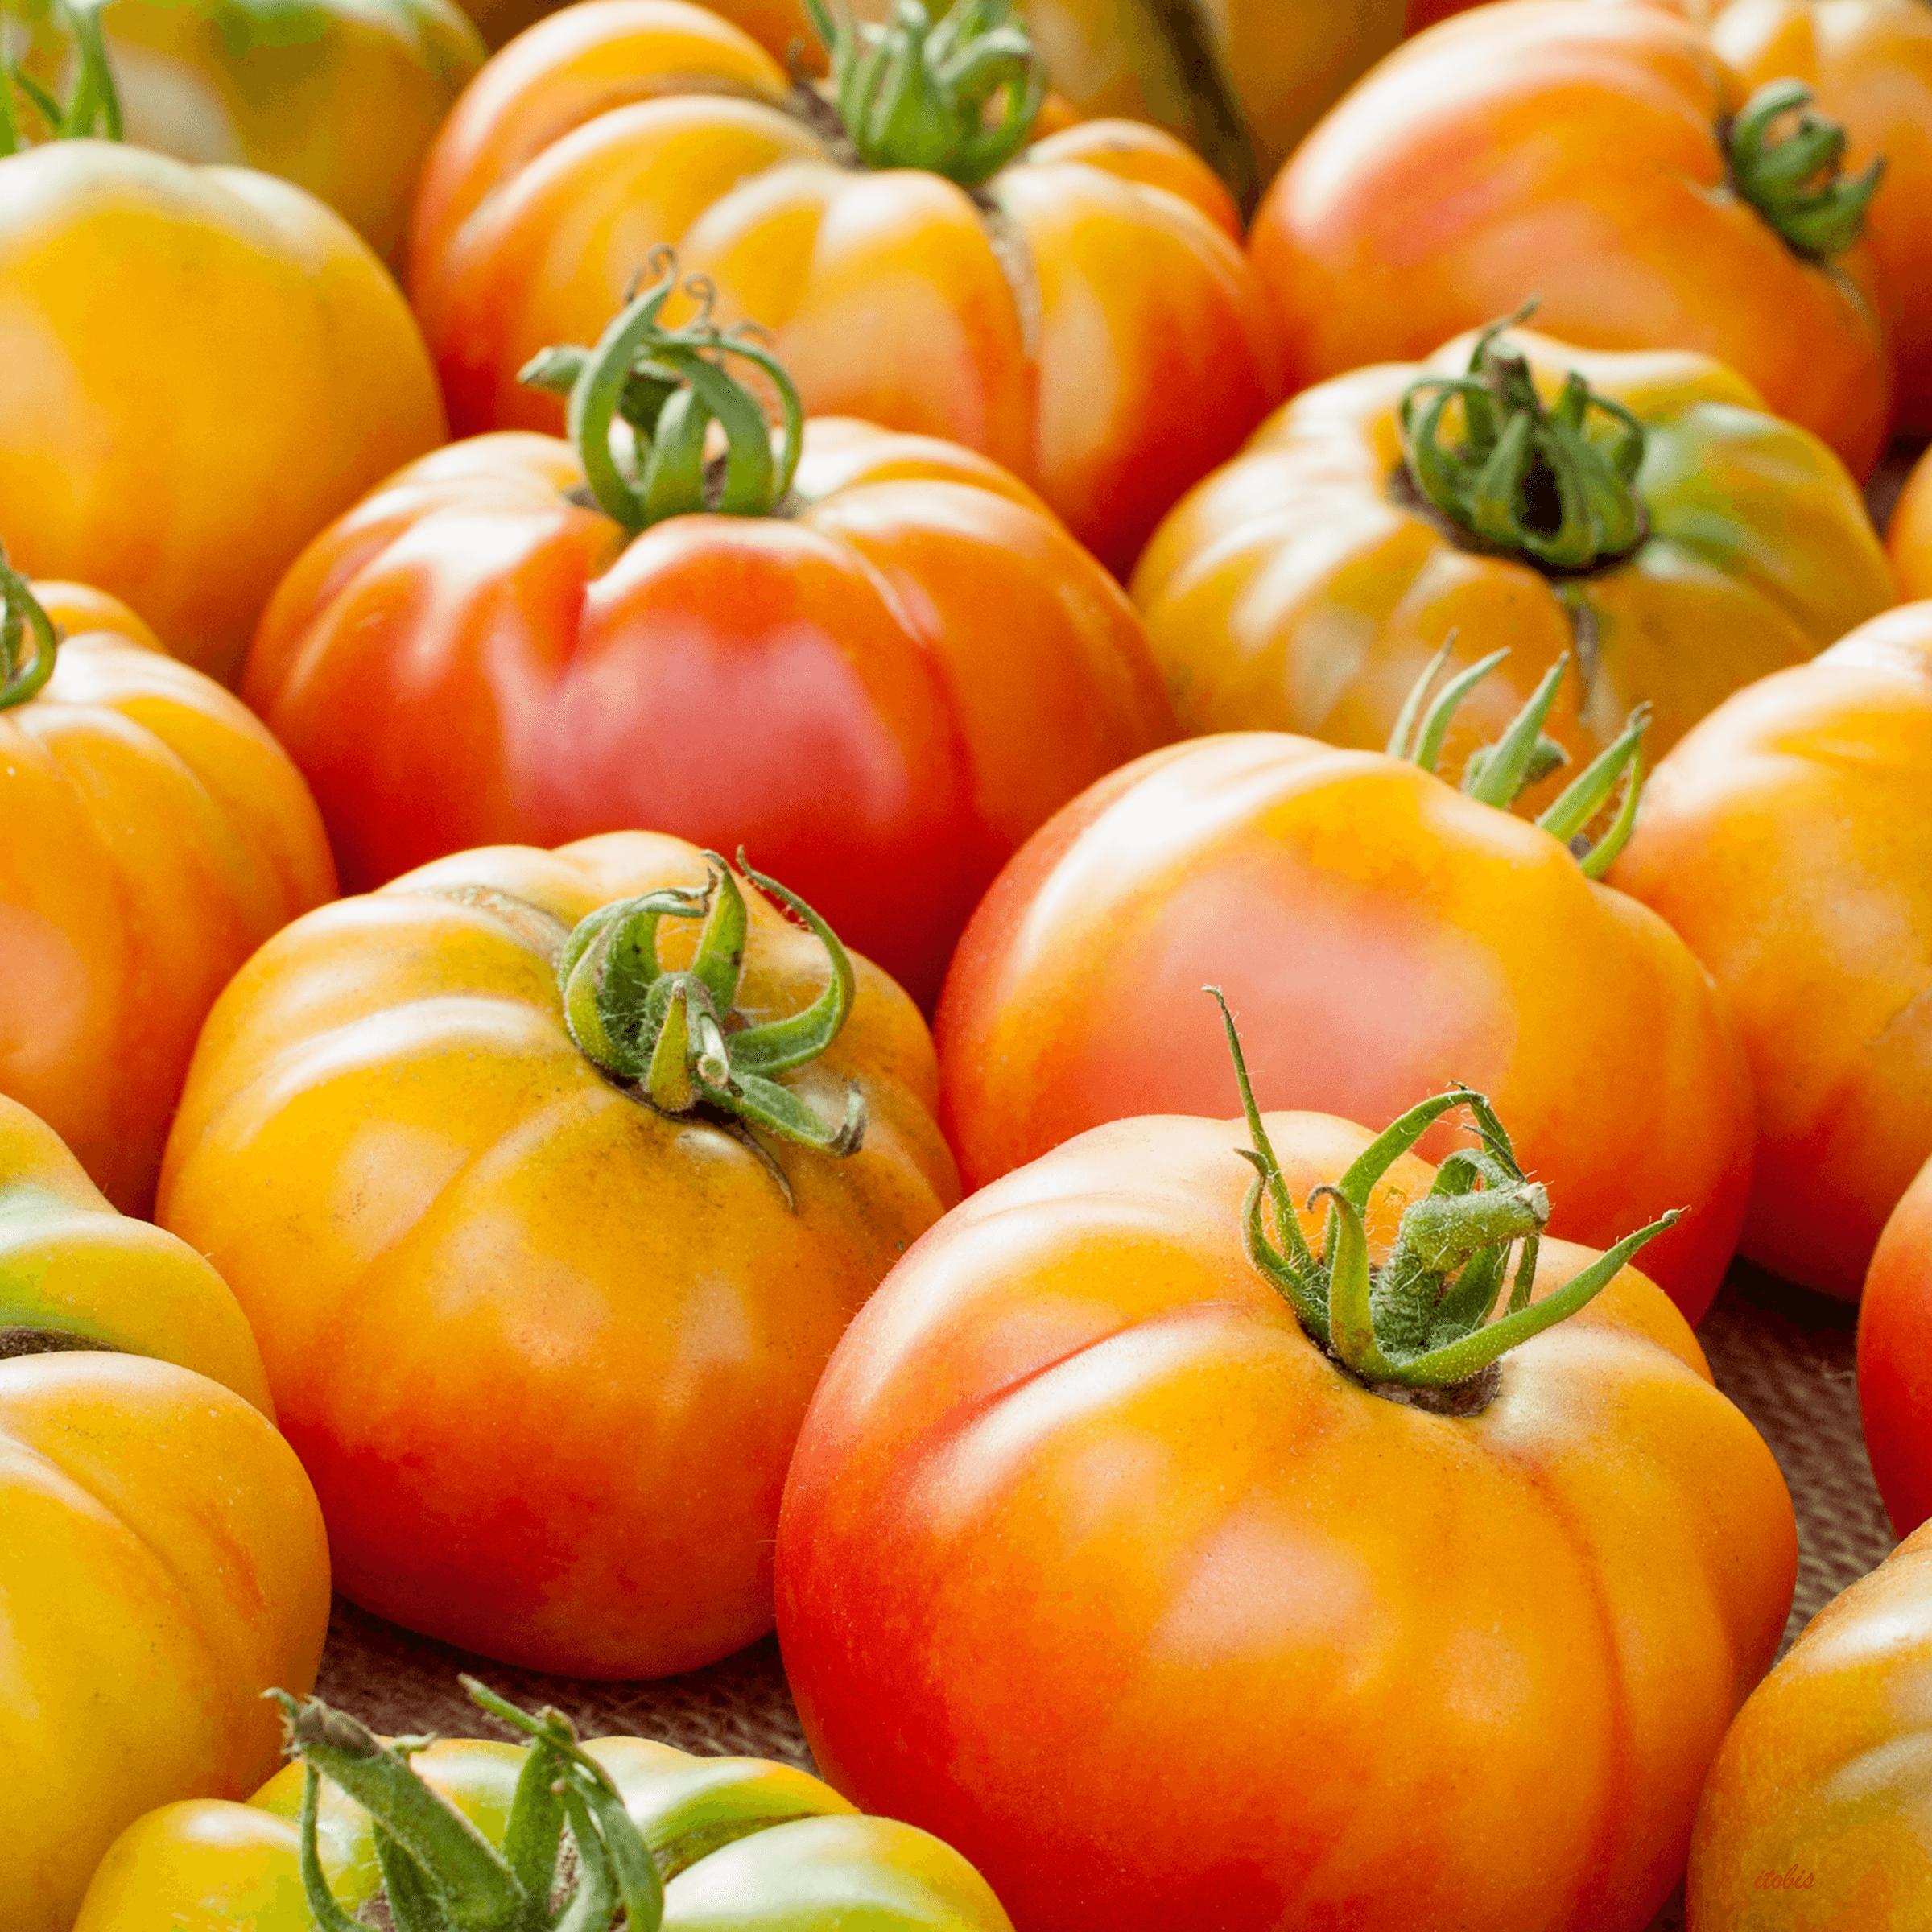 tomatoes-yellow-red-framersmarket-VF102-itobis.png